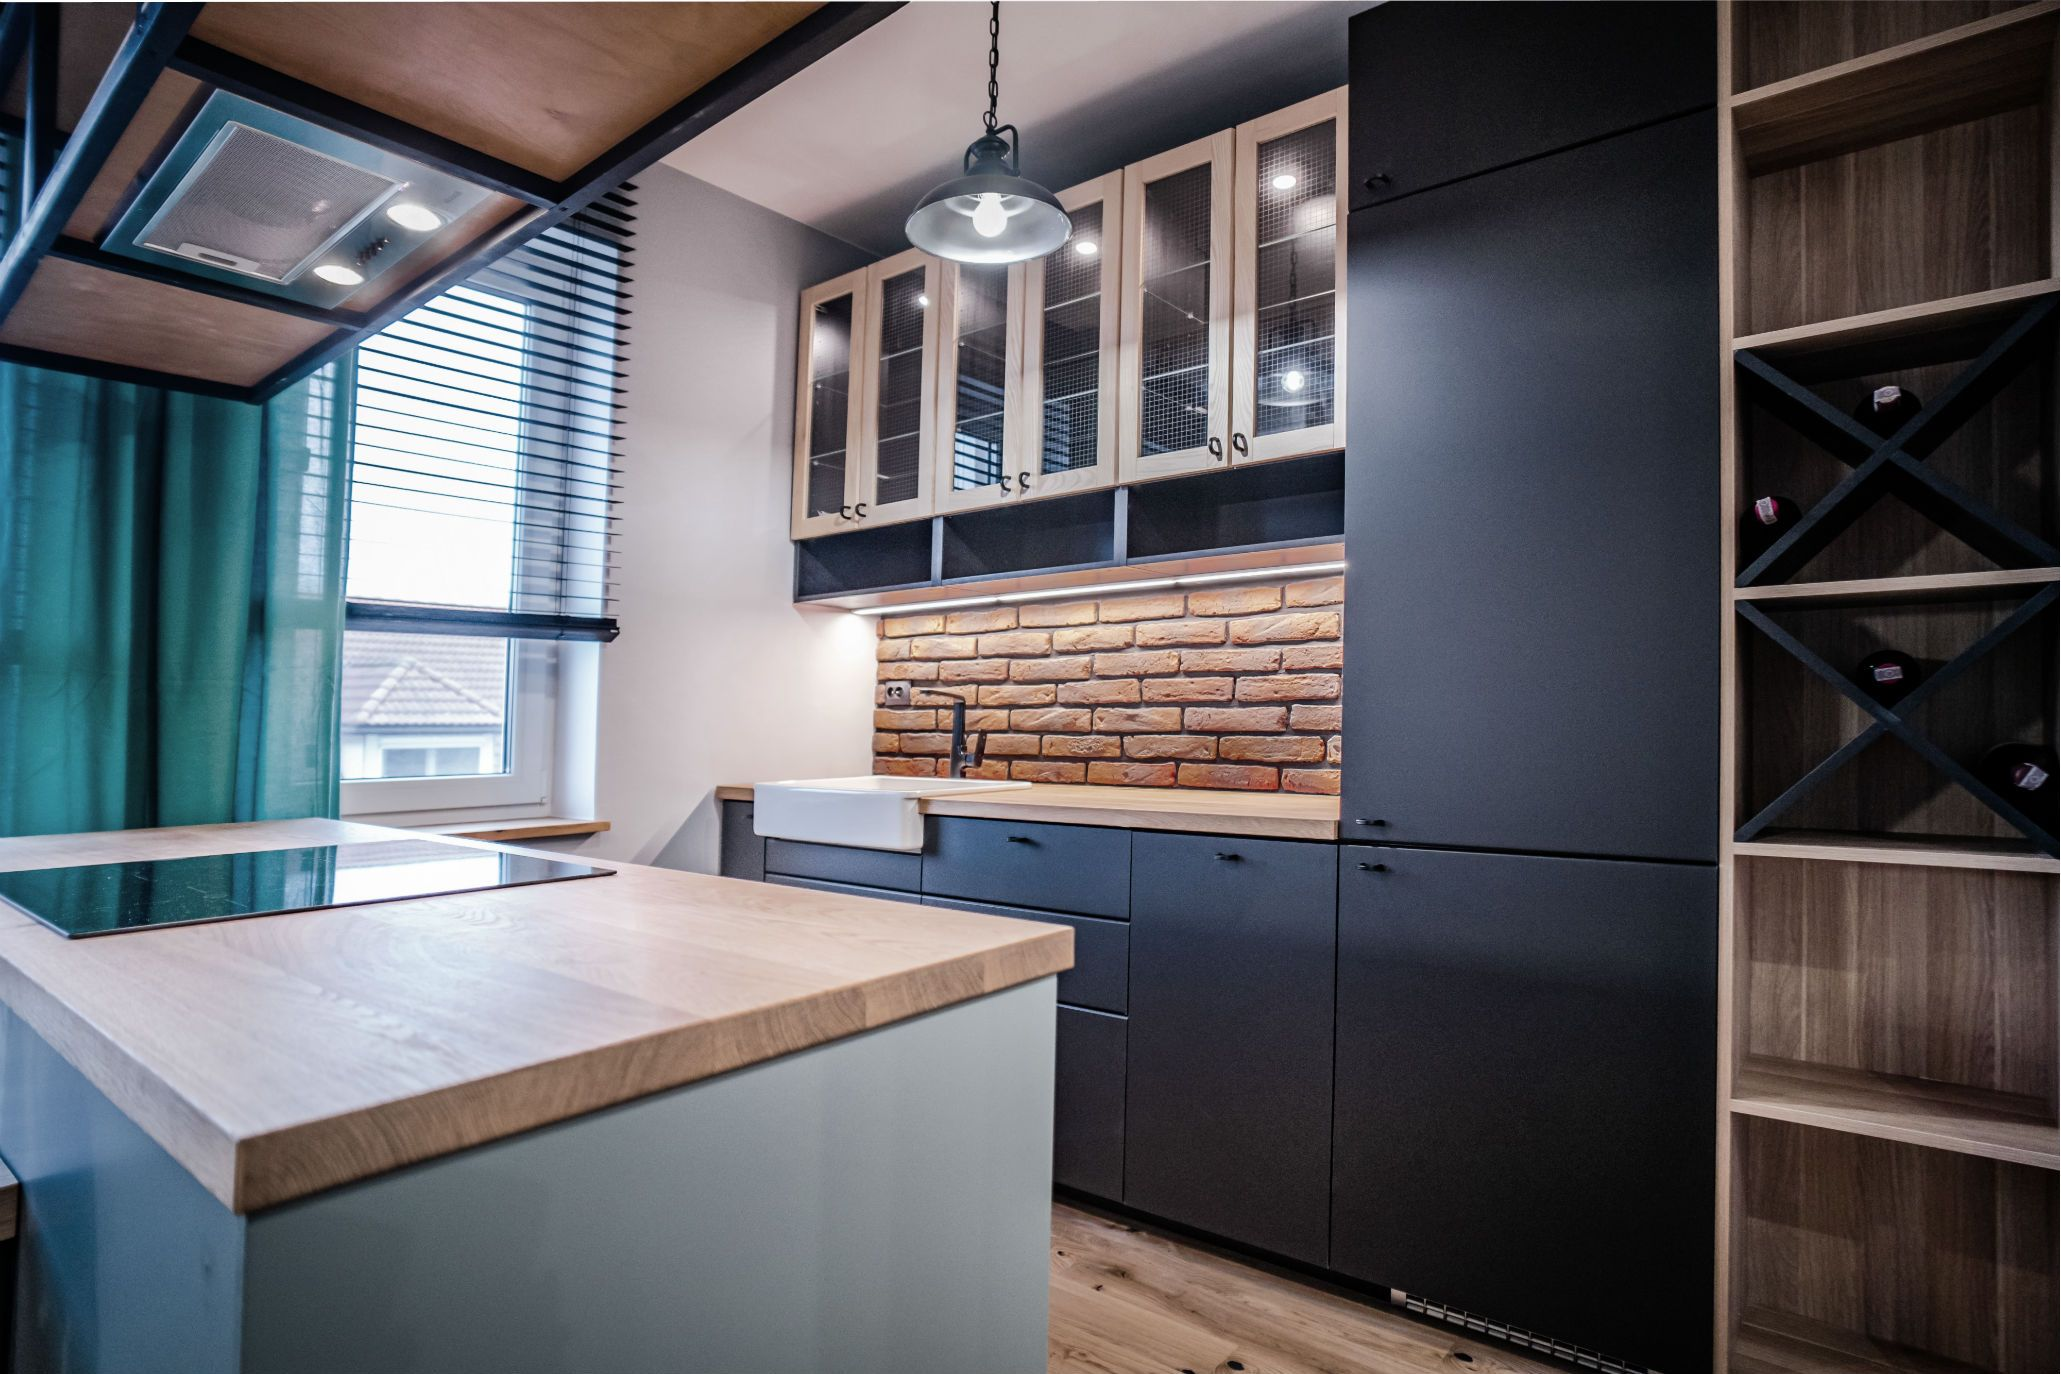 Kuchnia Cegla Drewno I Czern Kitchen Brick Wood Black Kitchen Furniture Design Sweet Home Home